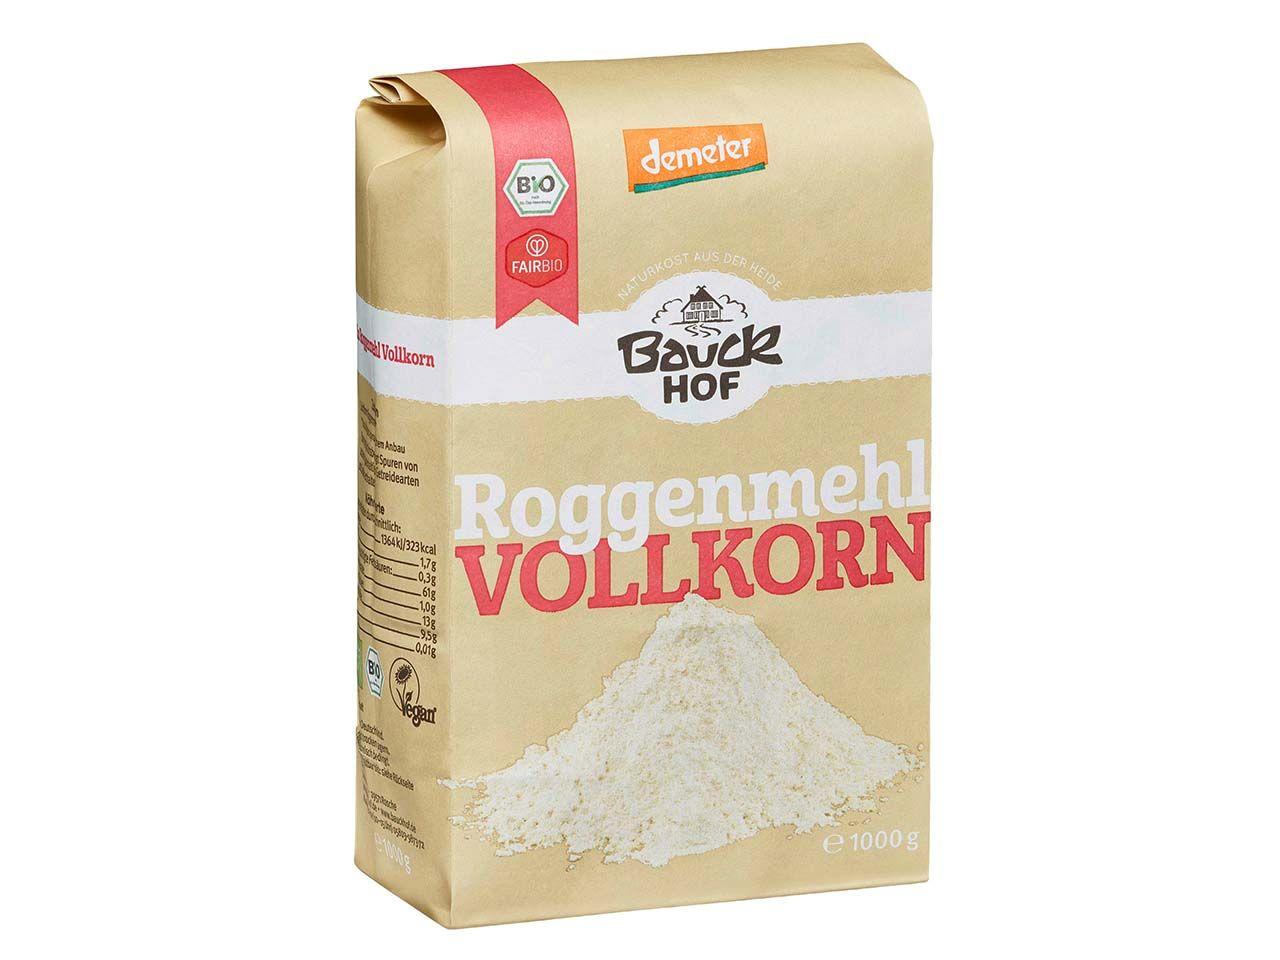 Bauckhof Bio-Vollkorn-Roggenmehl 1 kg 118250241